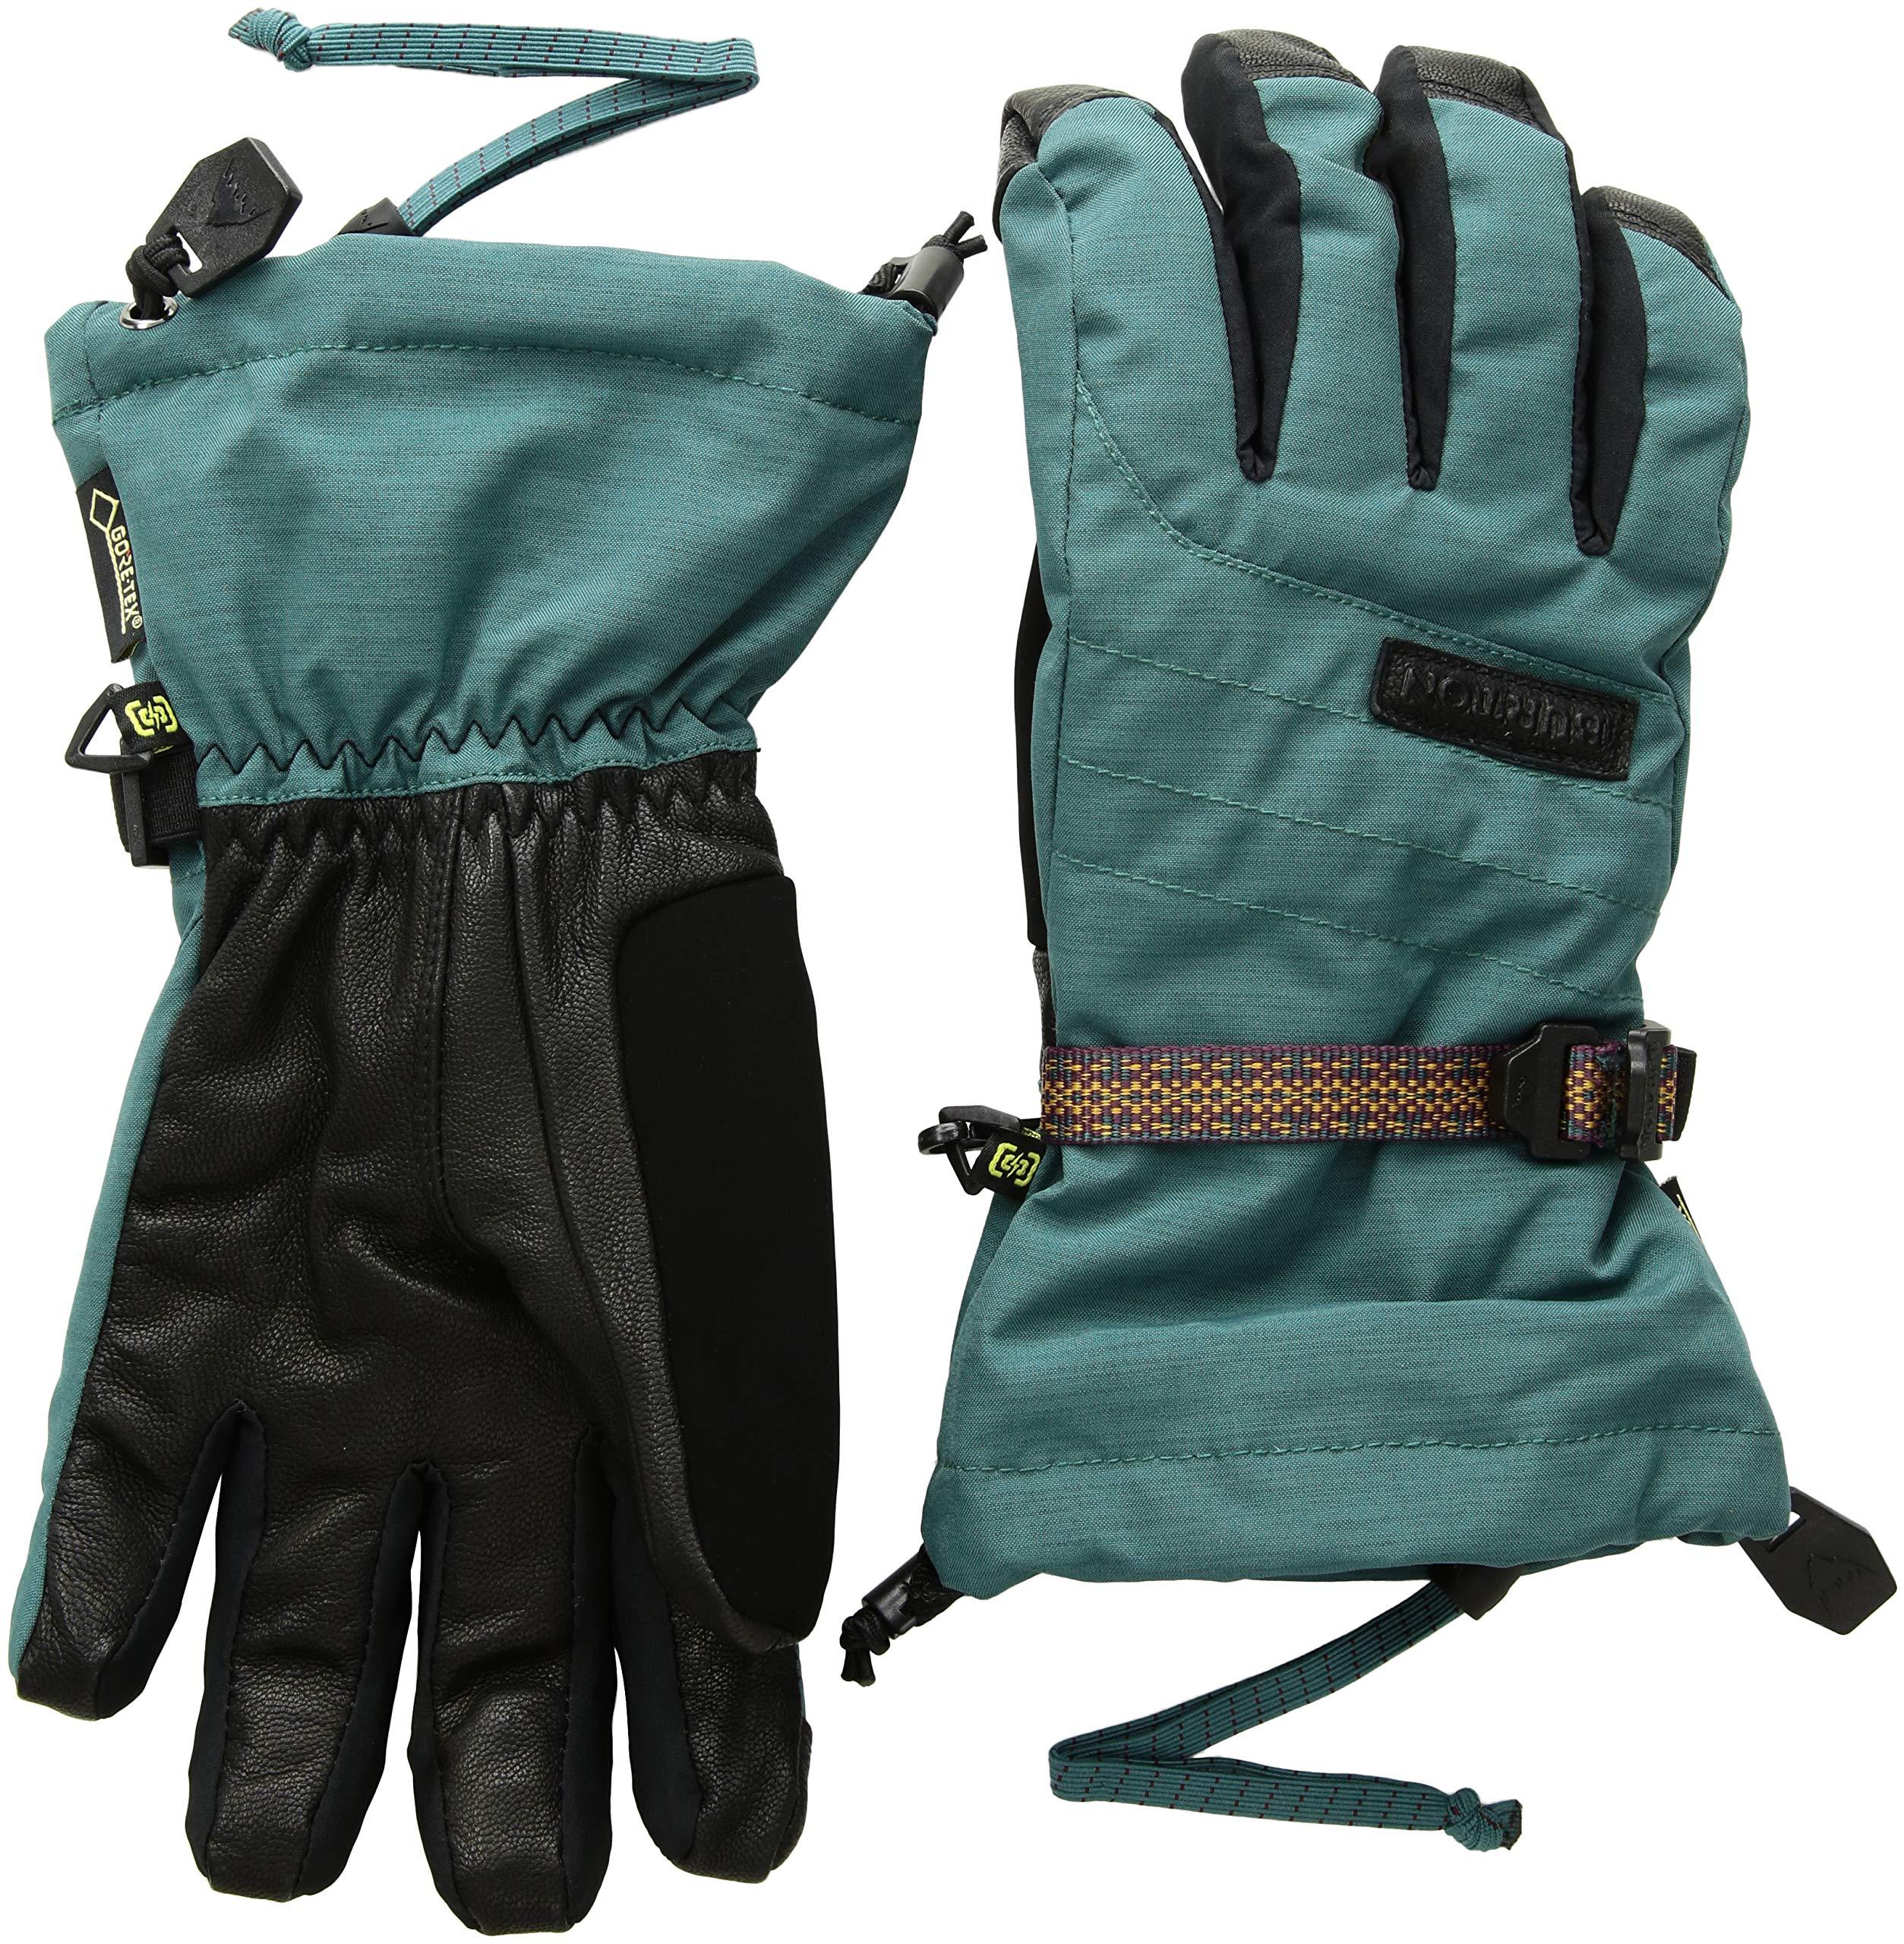 Burton Women's Deluxe Gore-tex Glove, Balsam Heather, Medium